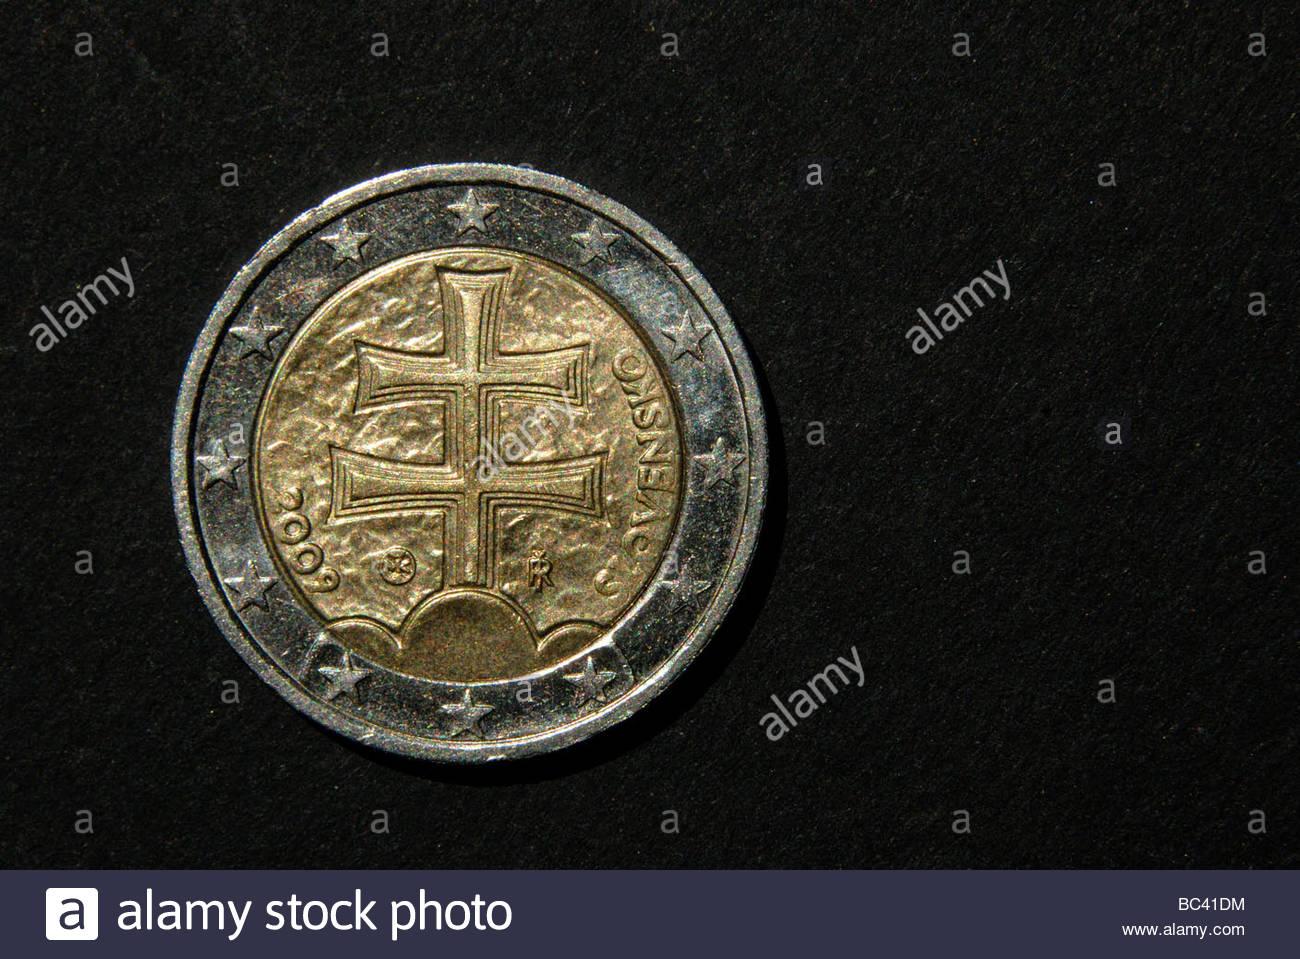 Slowakische 2 Euro Münze Stockfoto Bild 24675216 Alamy